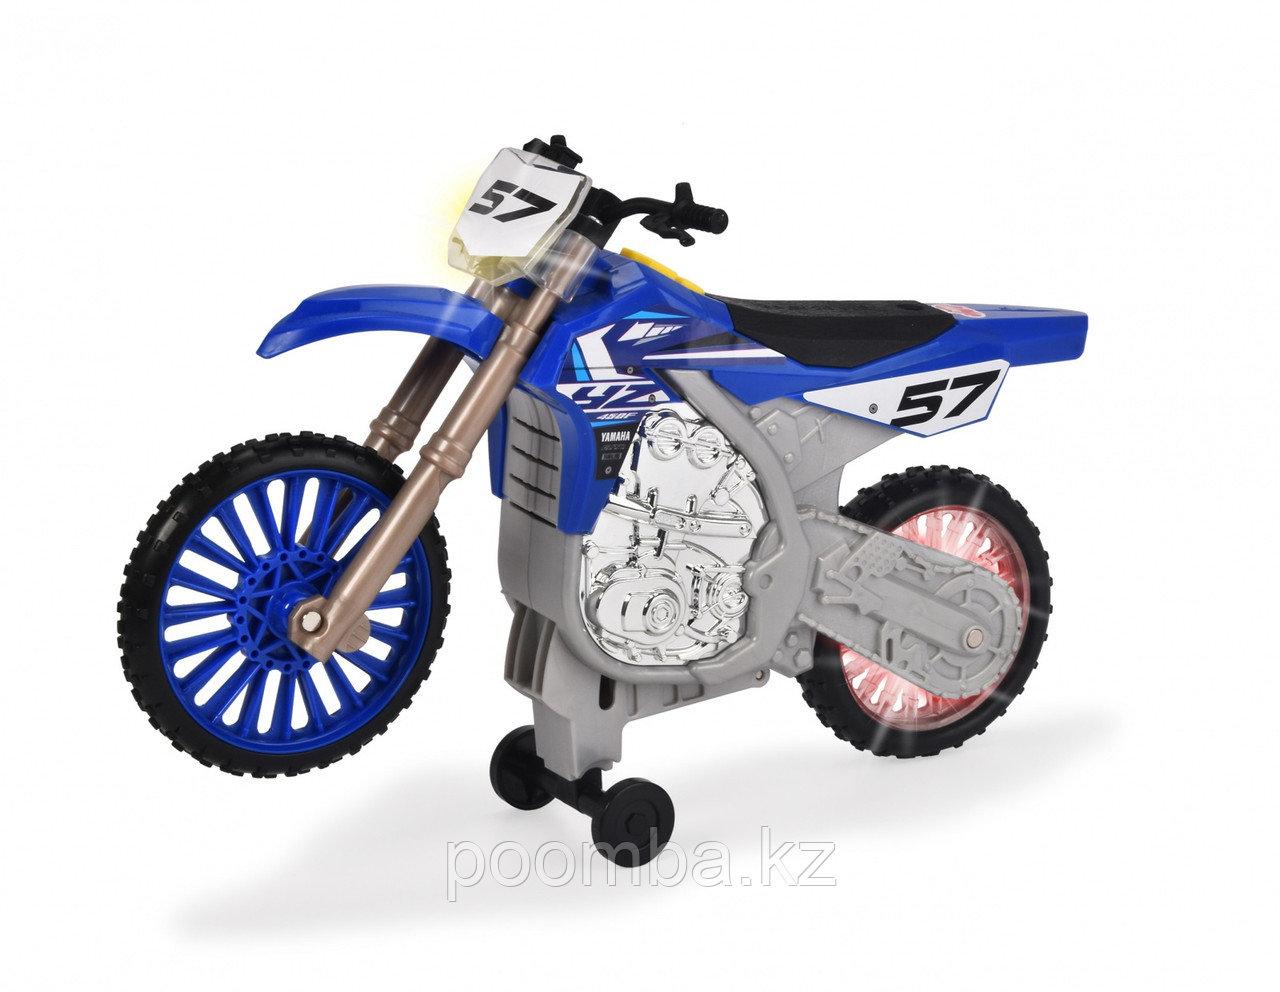 Мотоцикл Yamaha YZ  моторизированный, 26 см  Dickie Toys